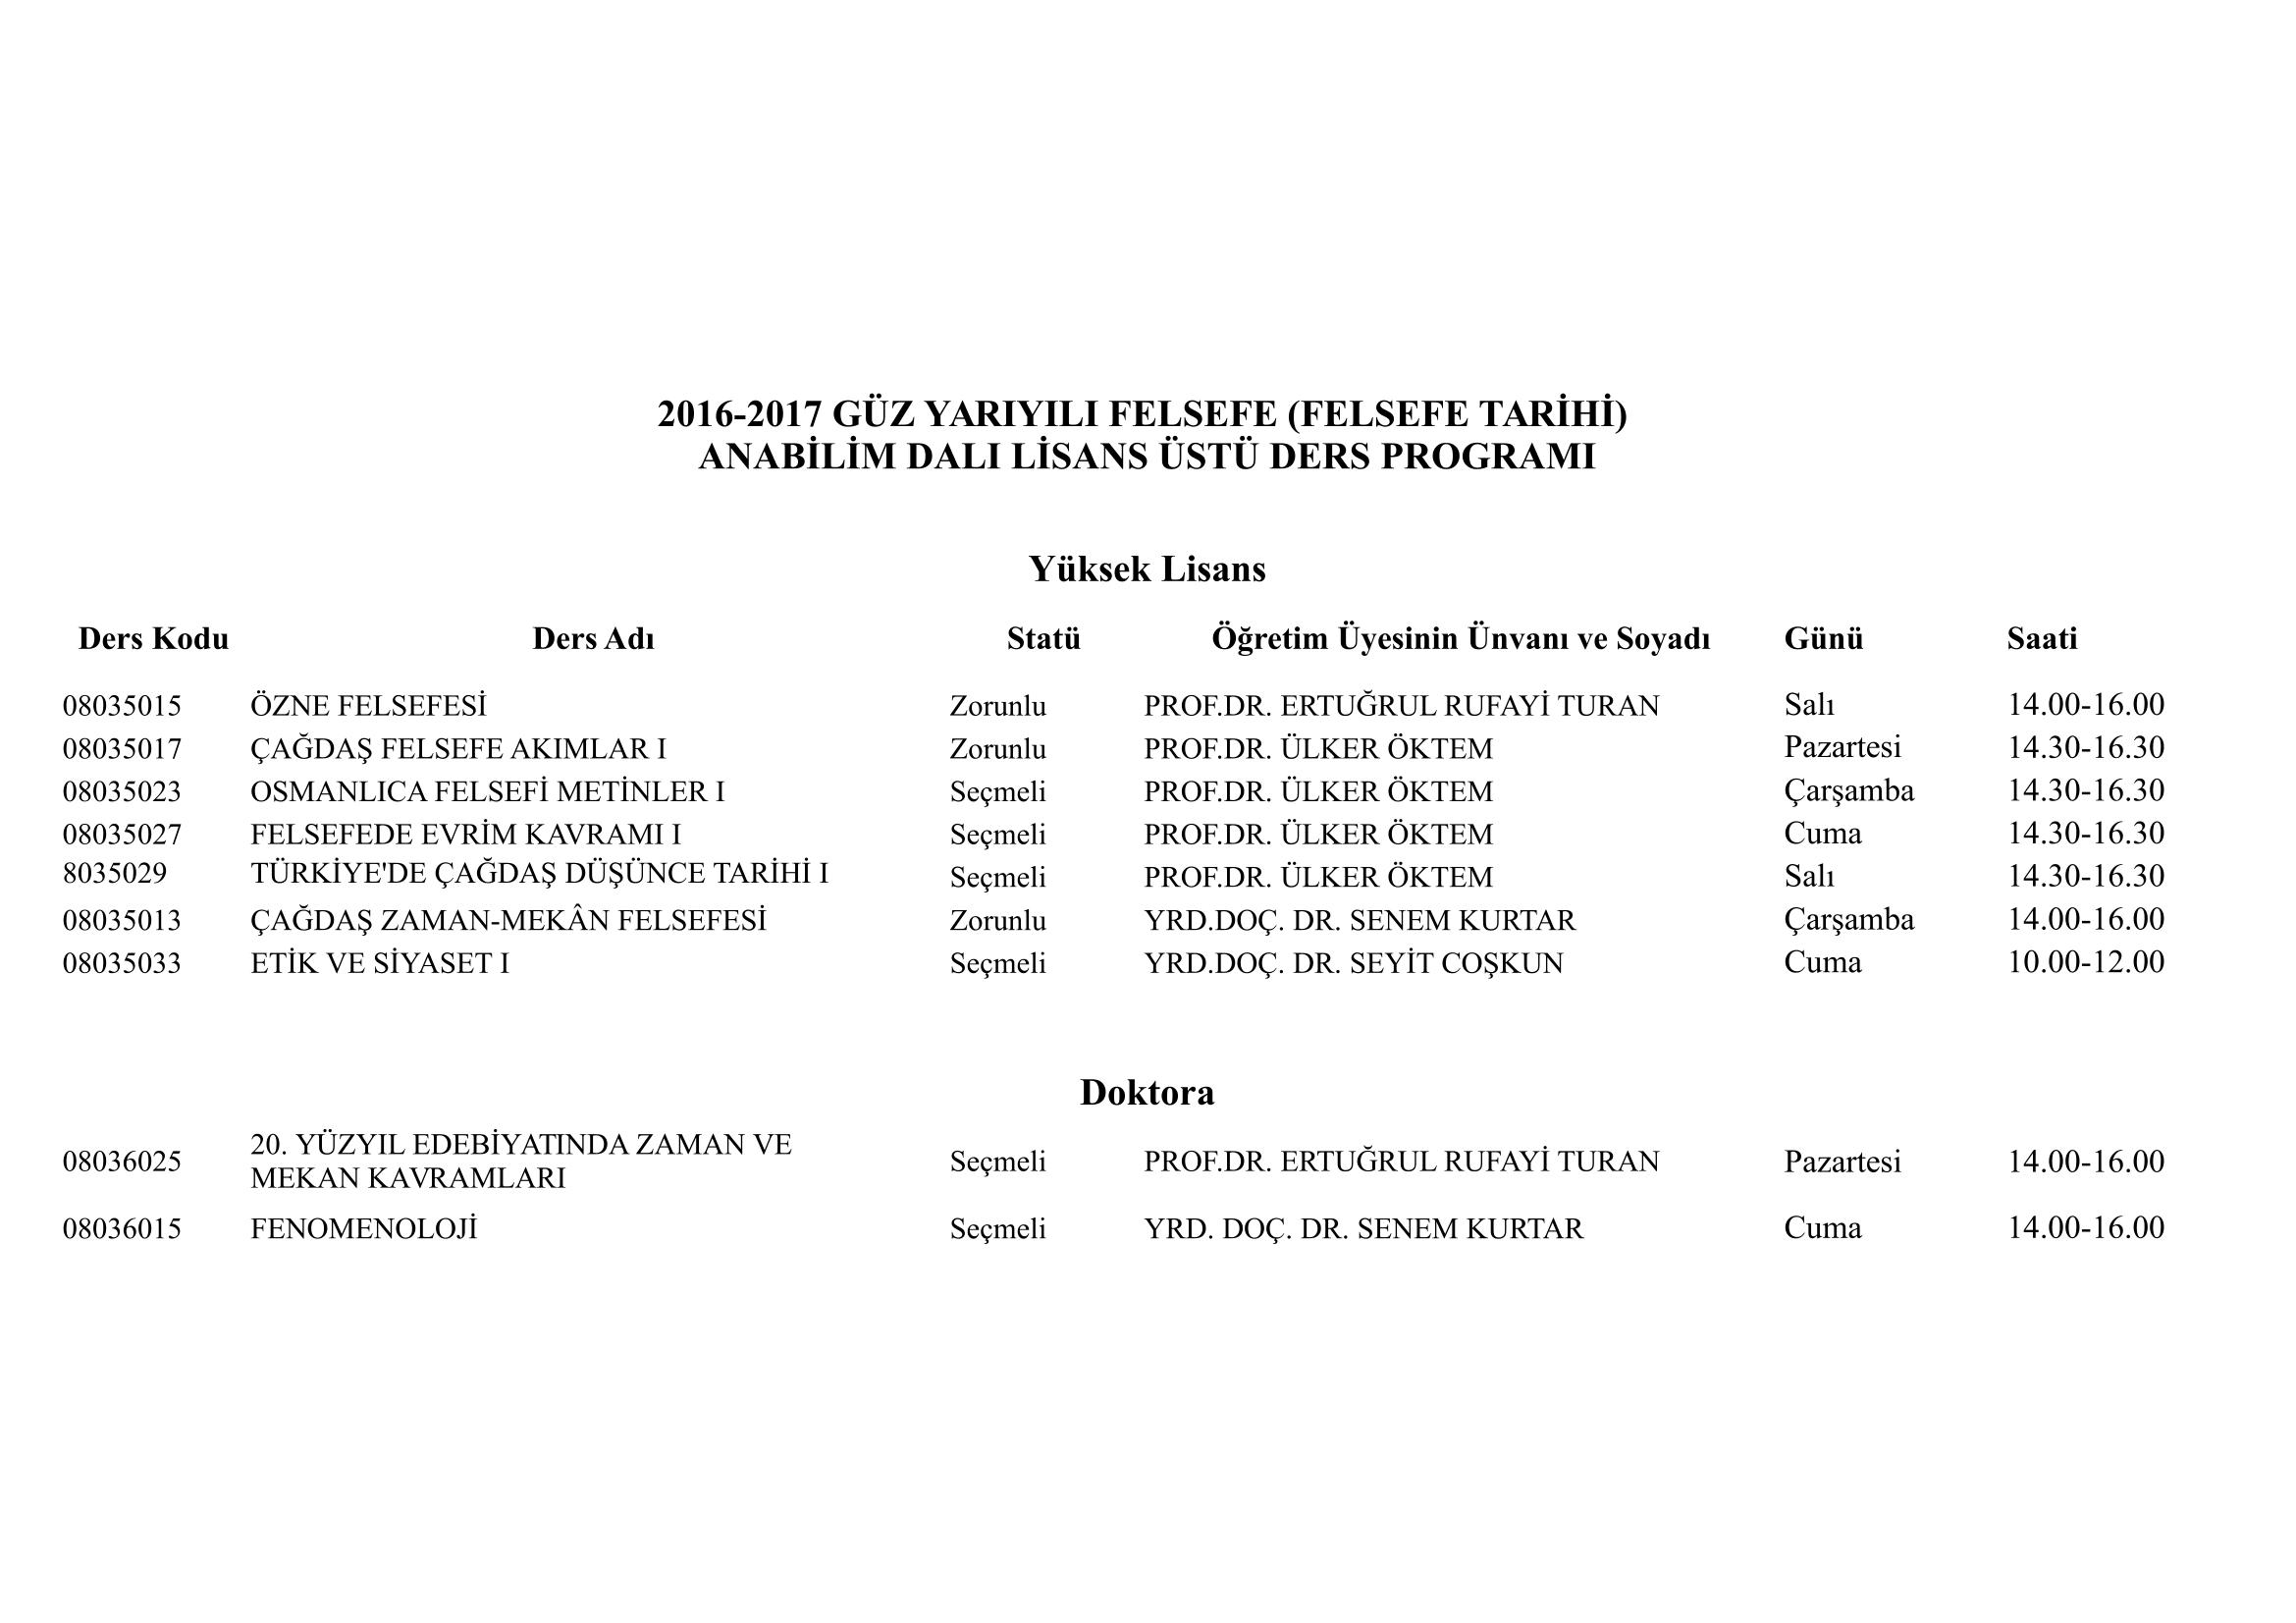 2016-2017-guz-donemi-felsefe-tarihi-lisansustu-dersler-kopya-xlsx-1